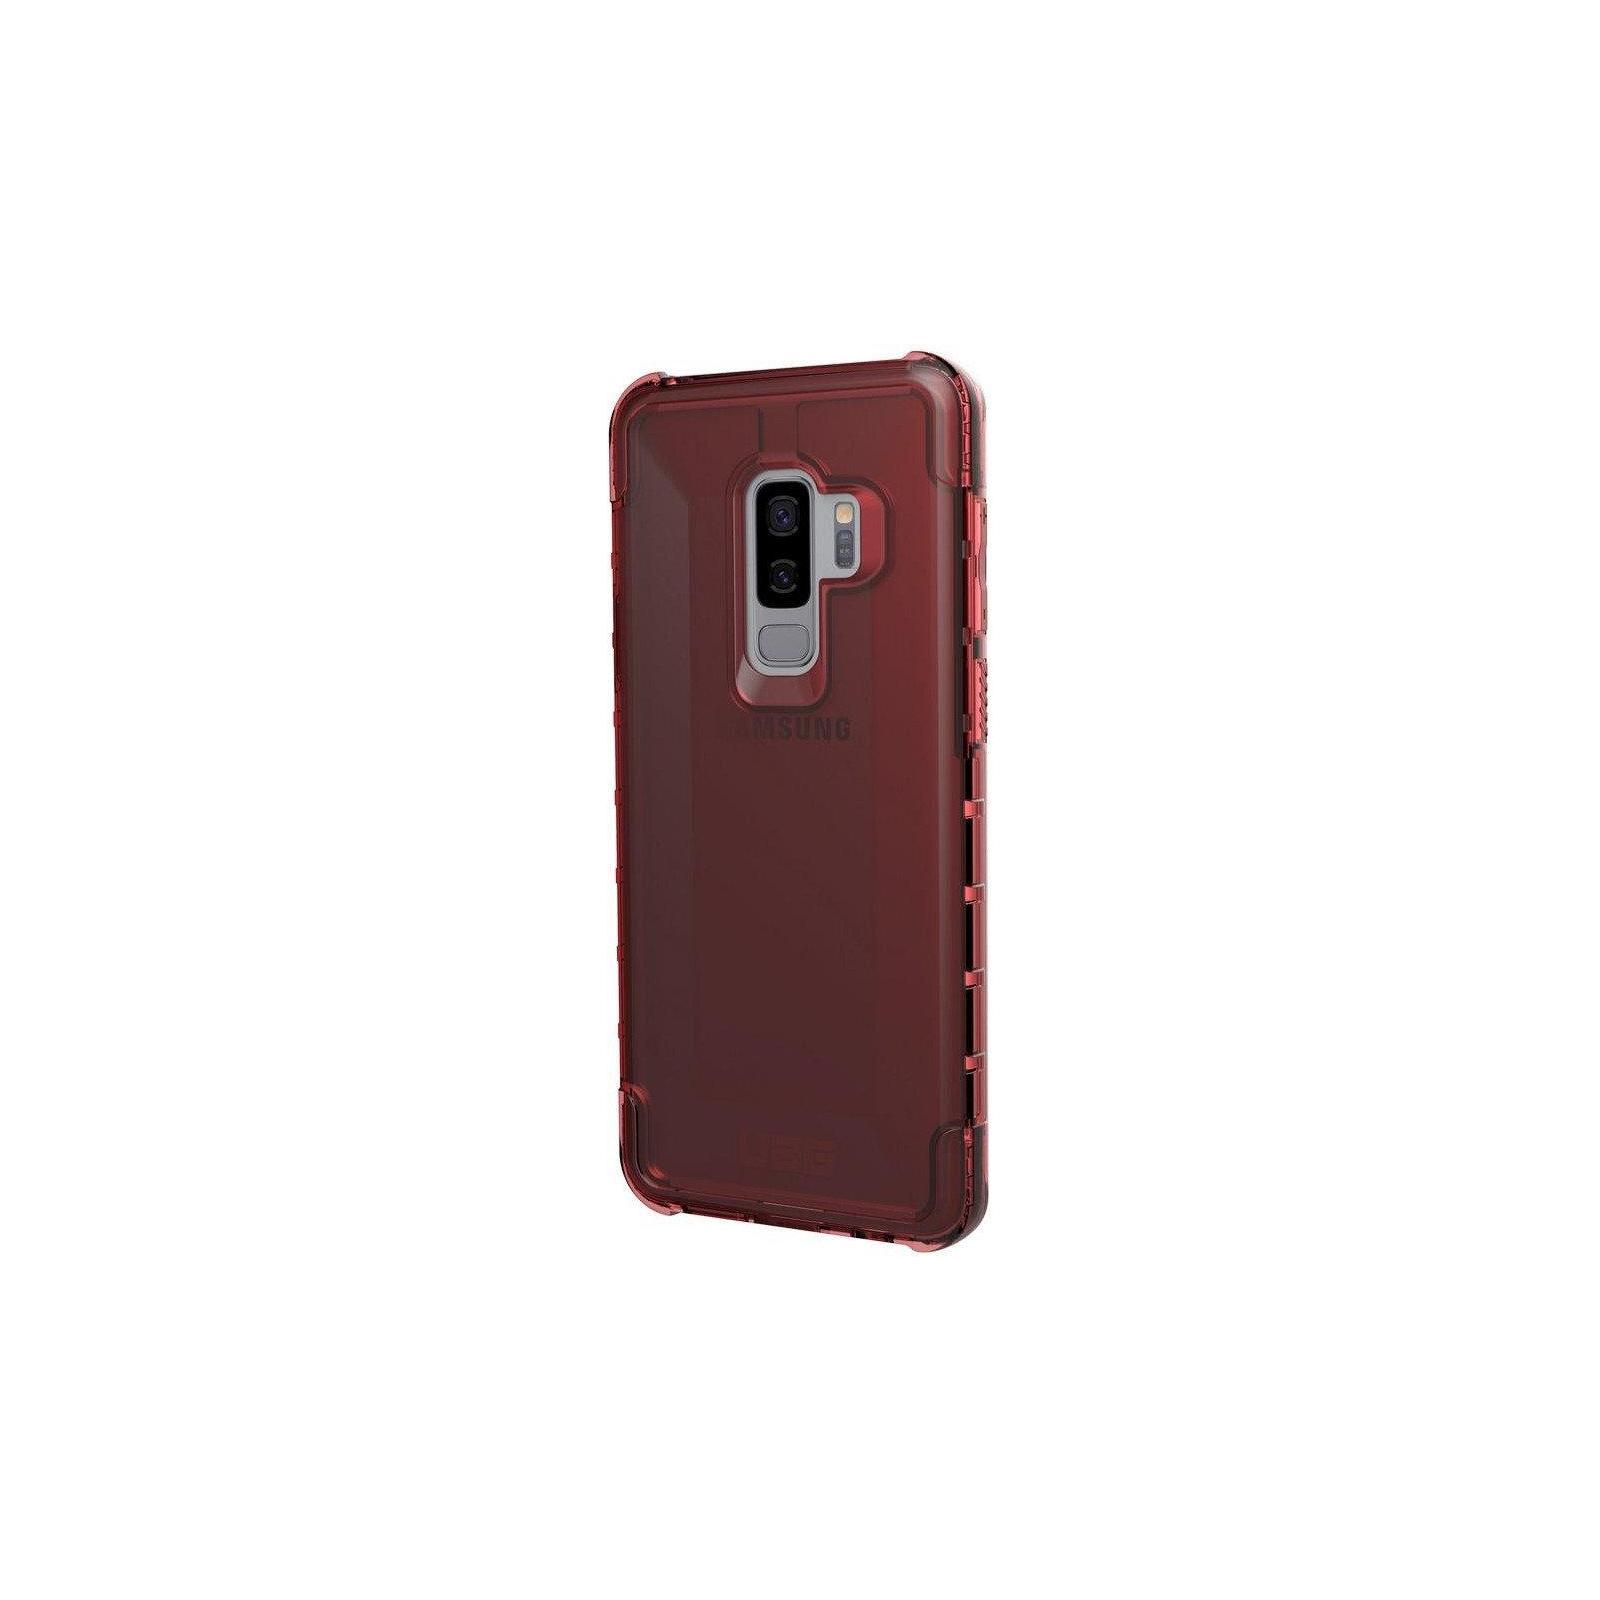 Чехол для моб. телефона Urban Armor Gear Galaxy S9+ PlyoCrimson (GLXS9PLS-Y-CR) изображение 4